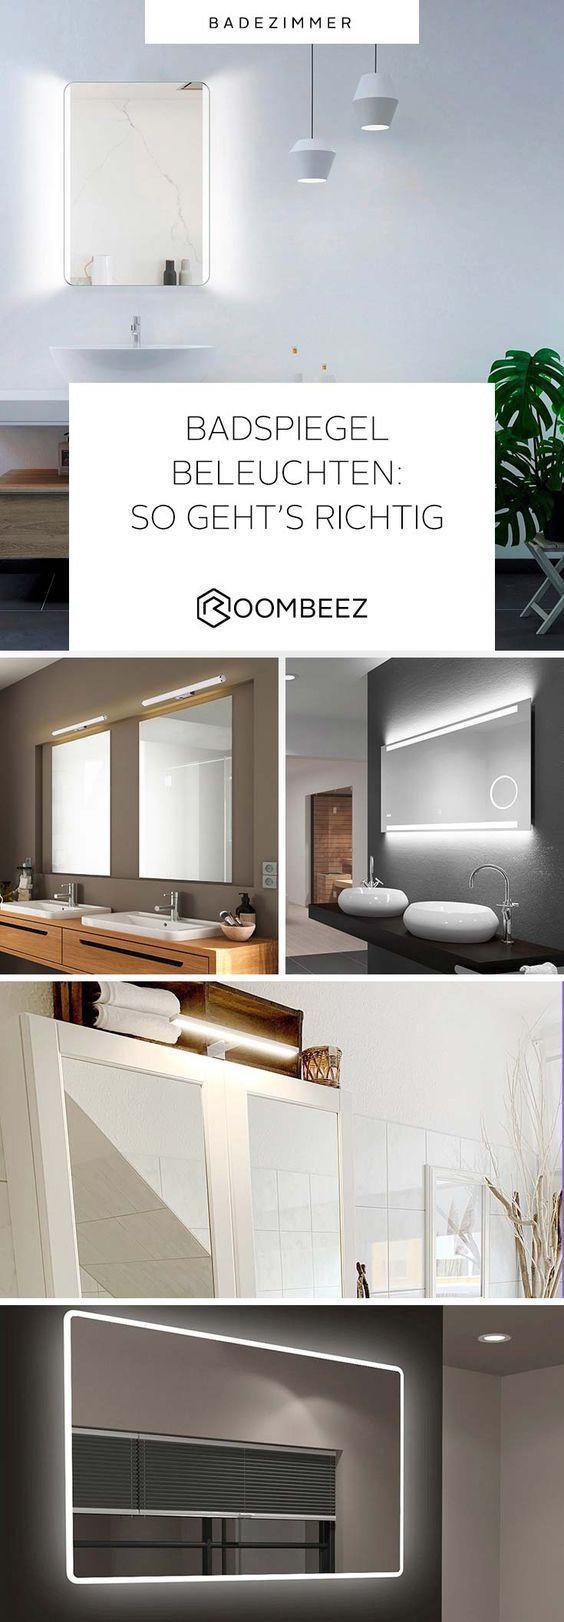 25++ Spiegel mit beleuchtung schminken ideen